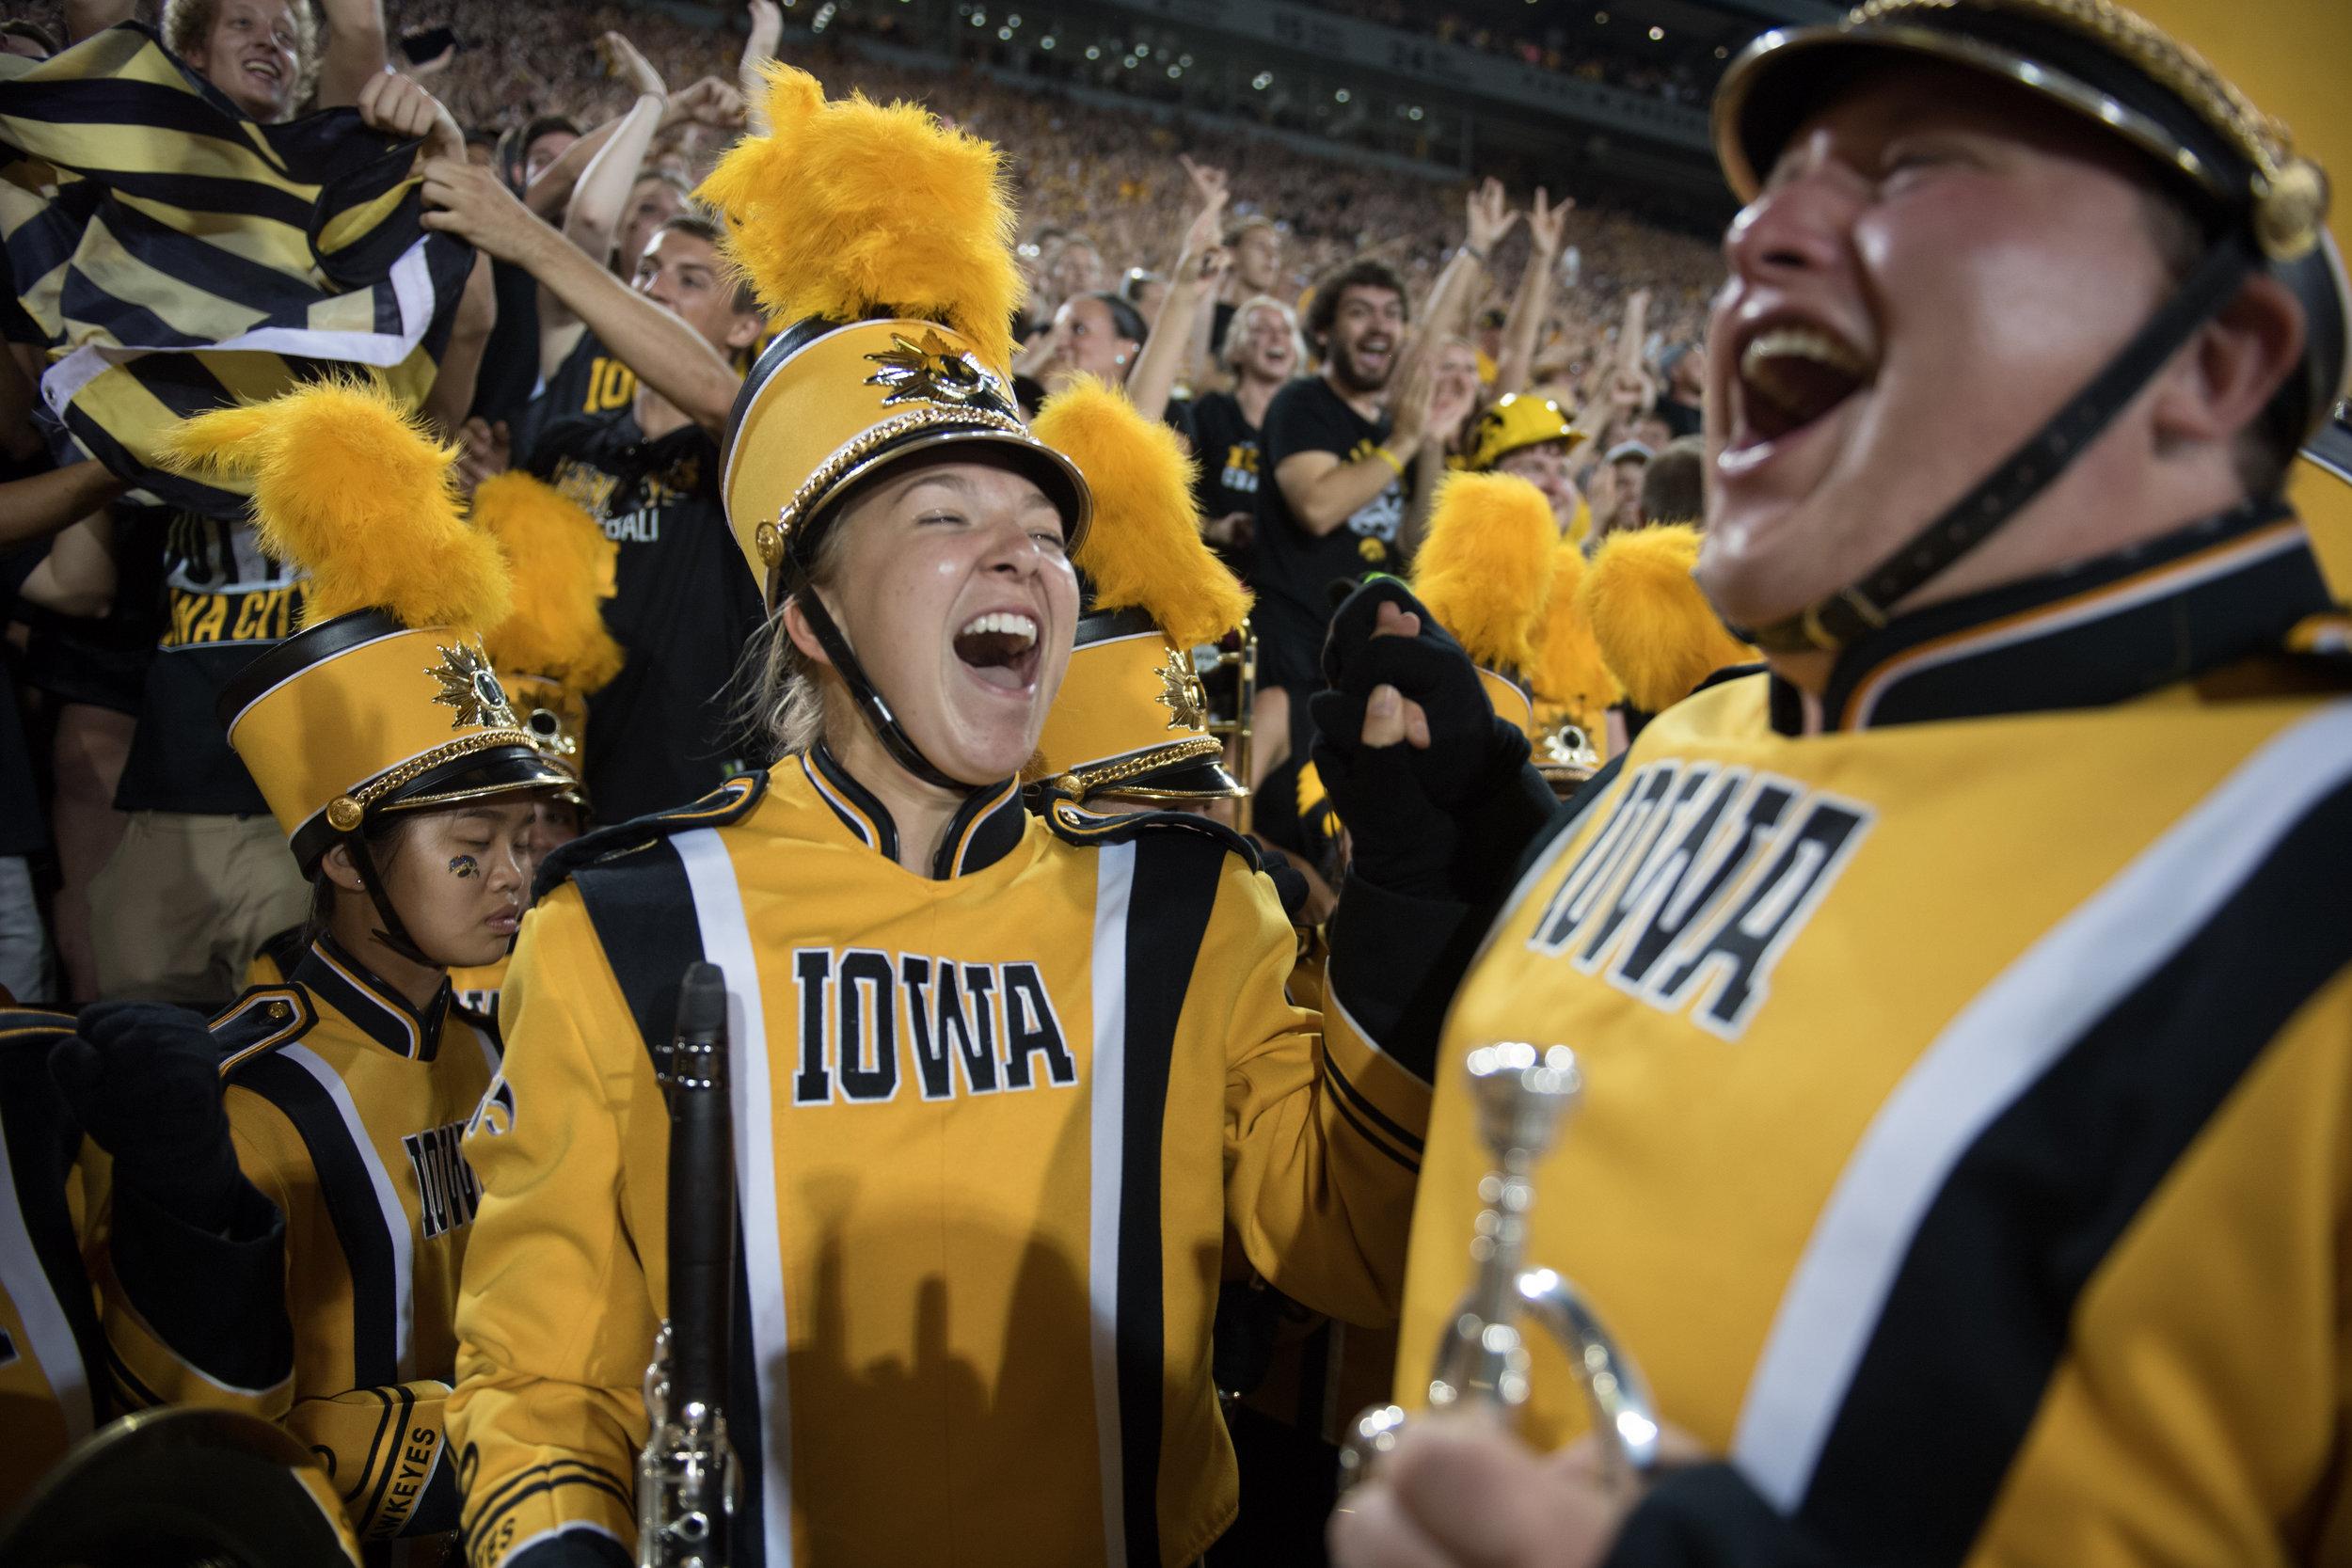 2017_09_23-Iowa v Penn State-tschoon-118.JPG